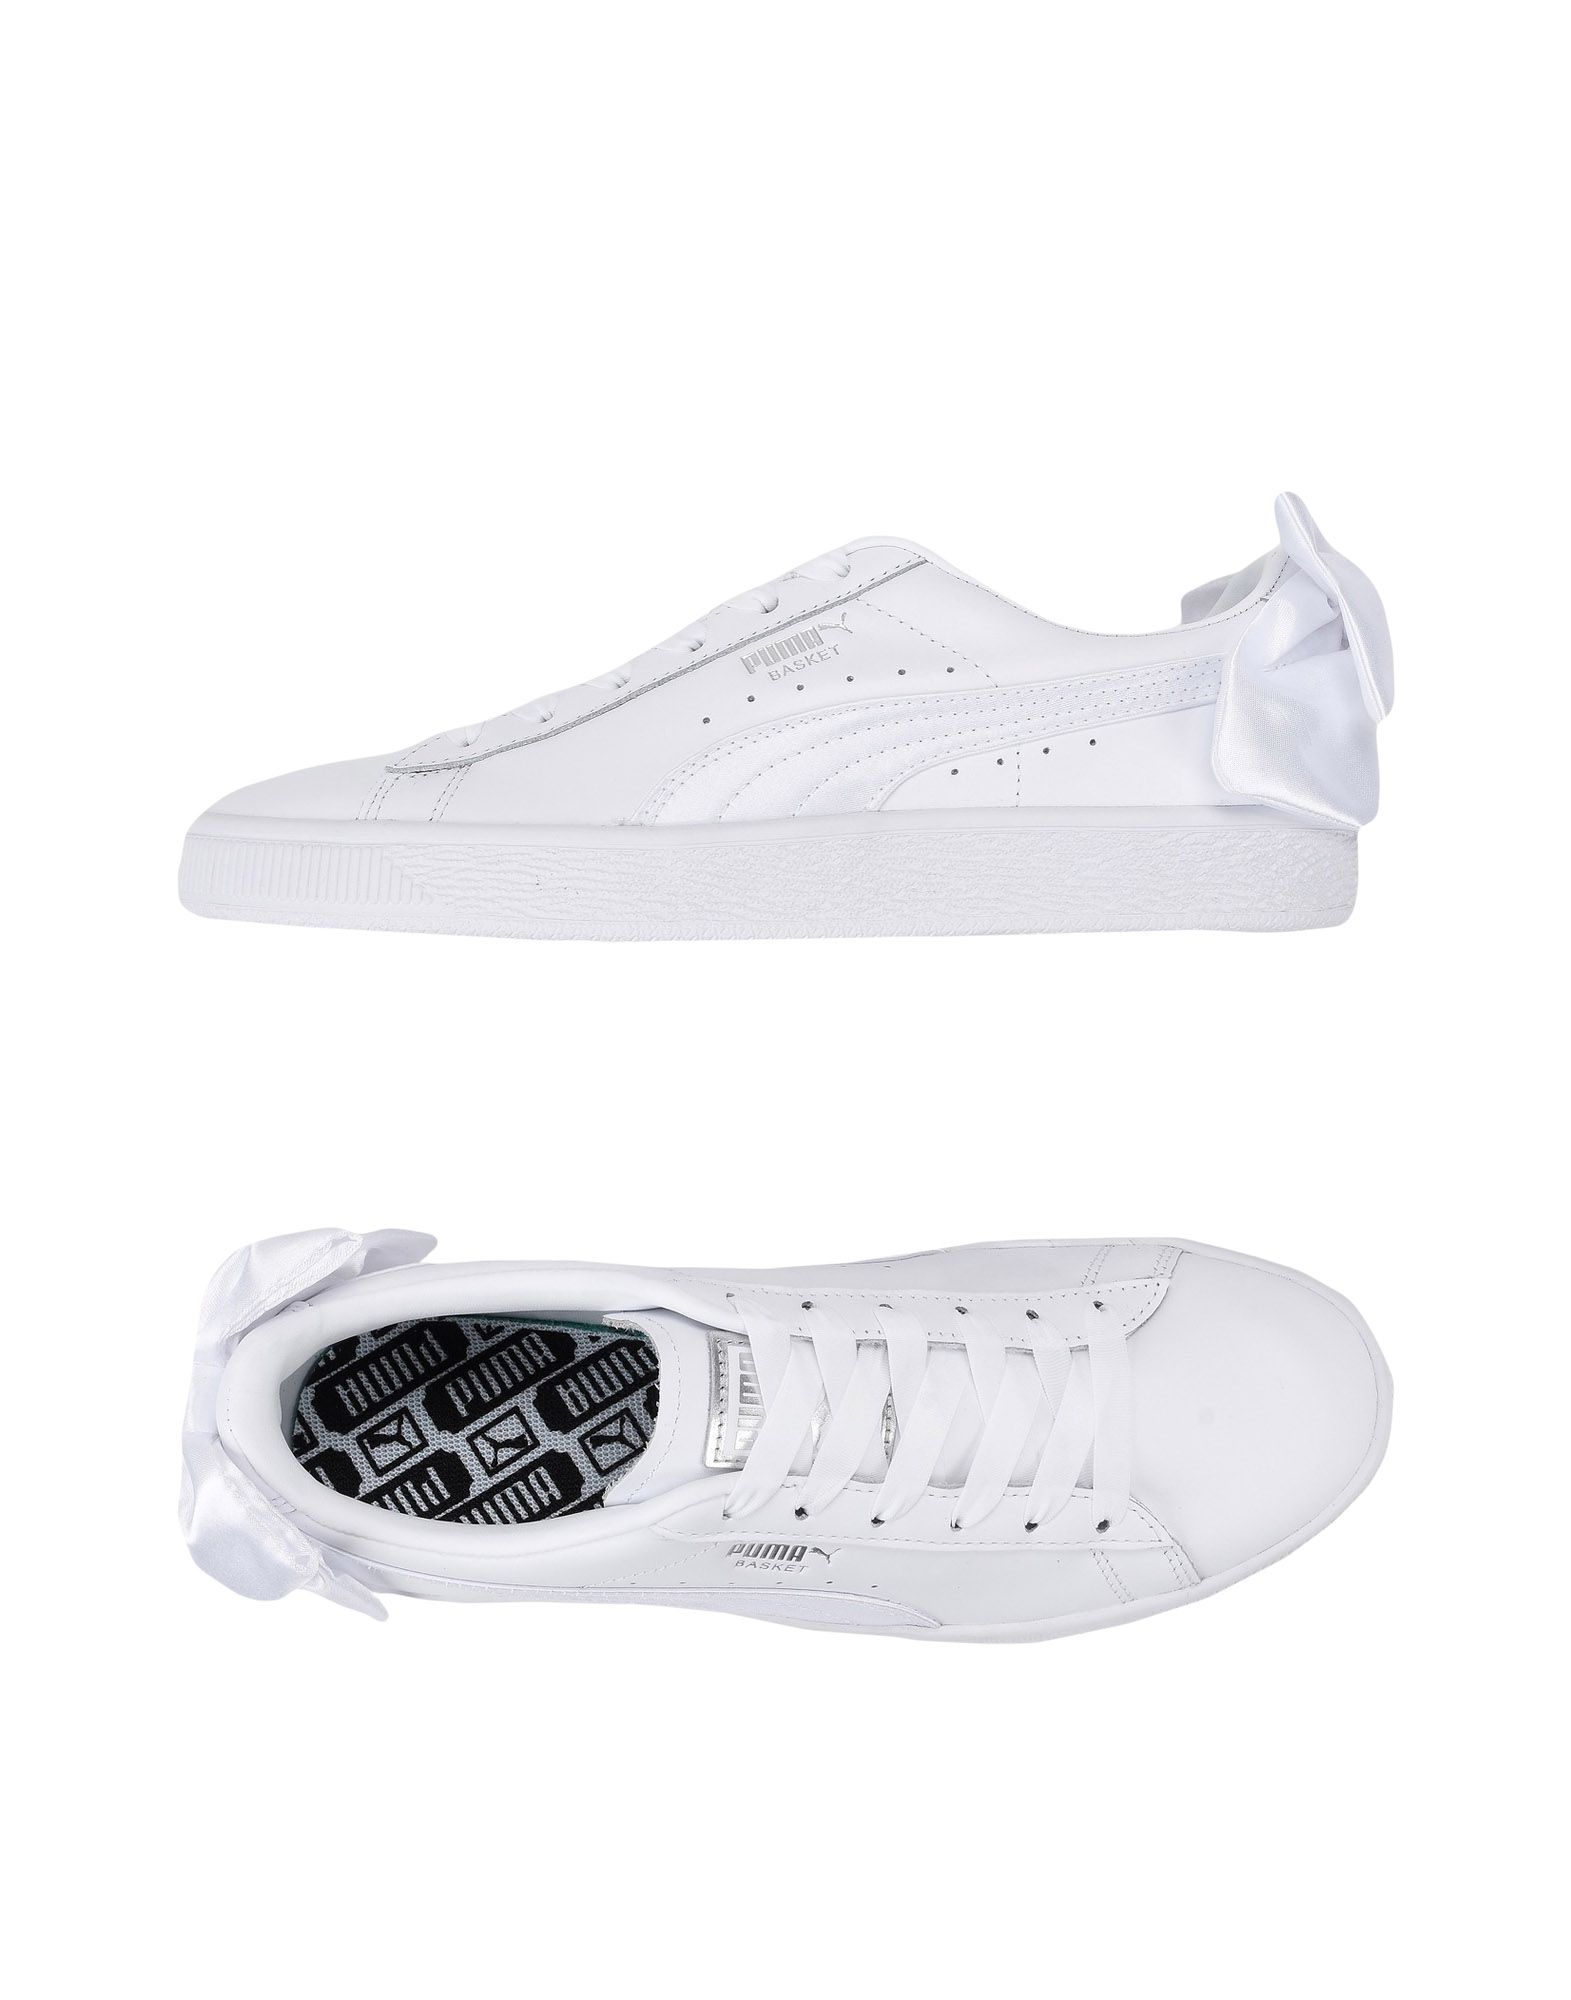 Puma Basket 11509312TC Qualität beliebte Schuhe Gute Bow